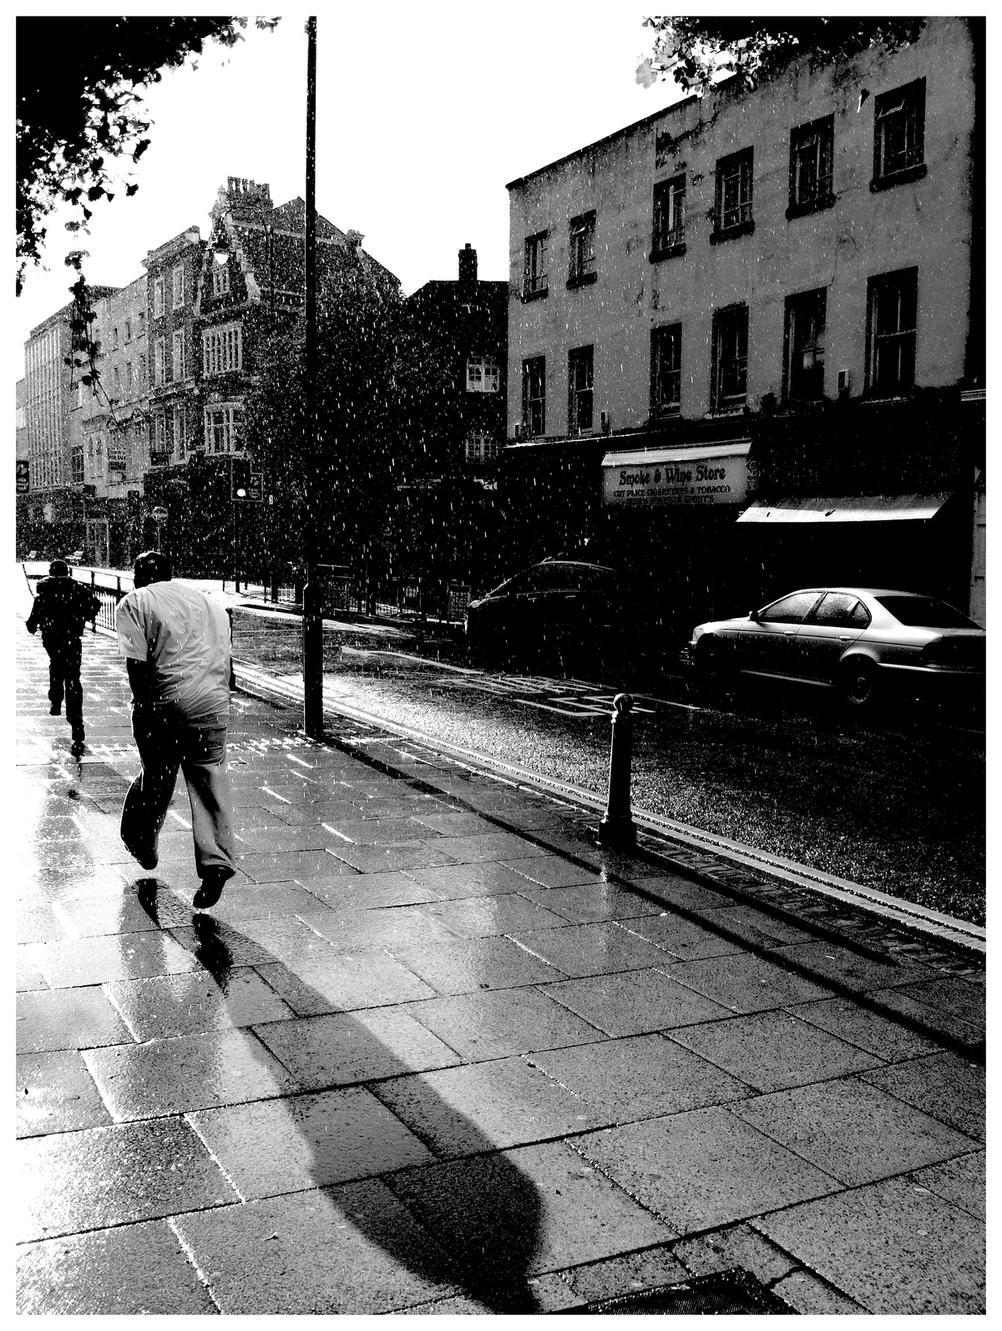 Photo of people running from rain.